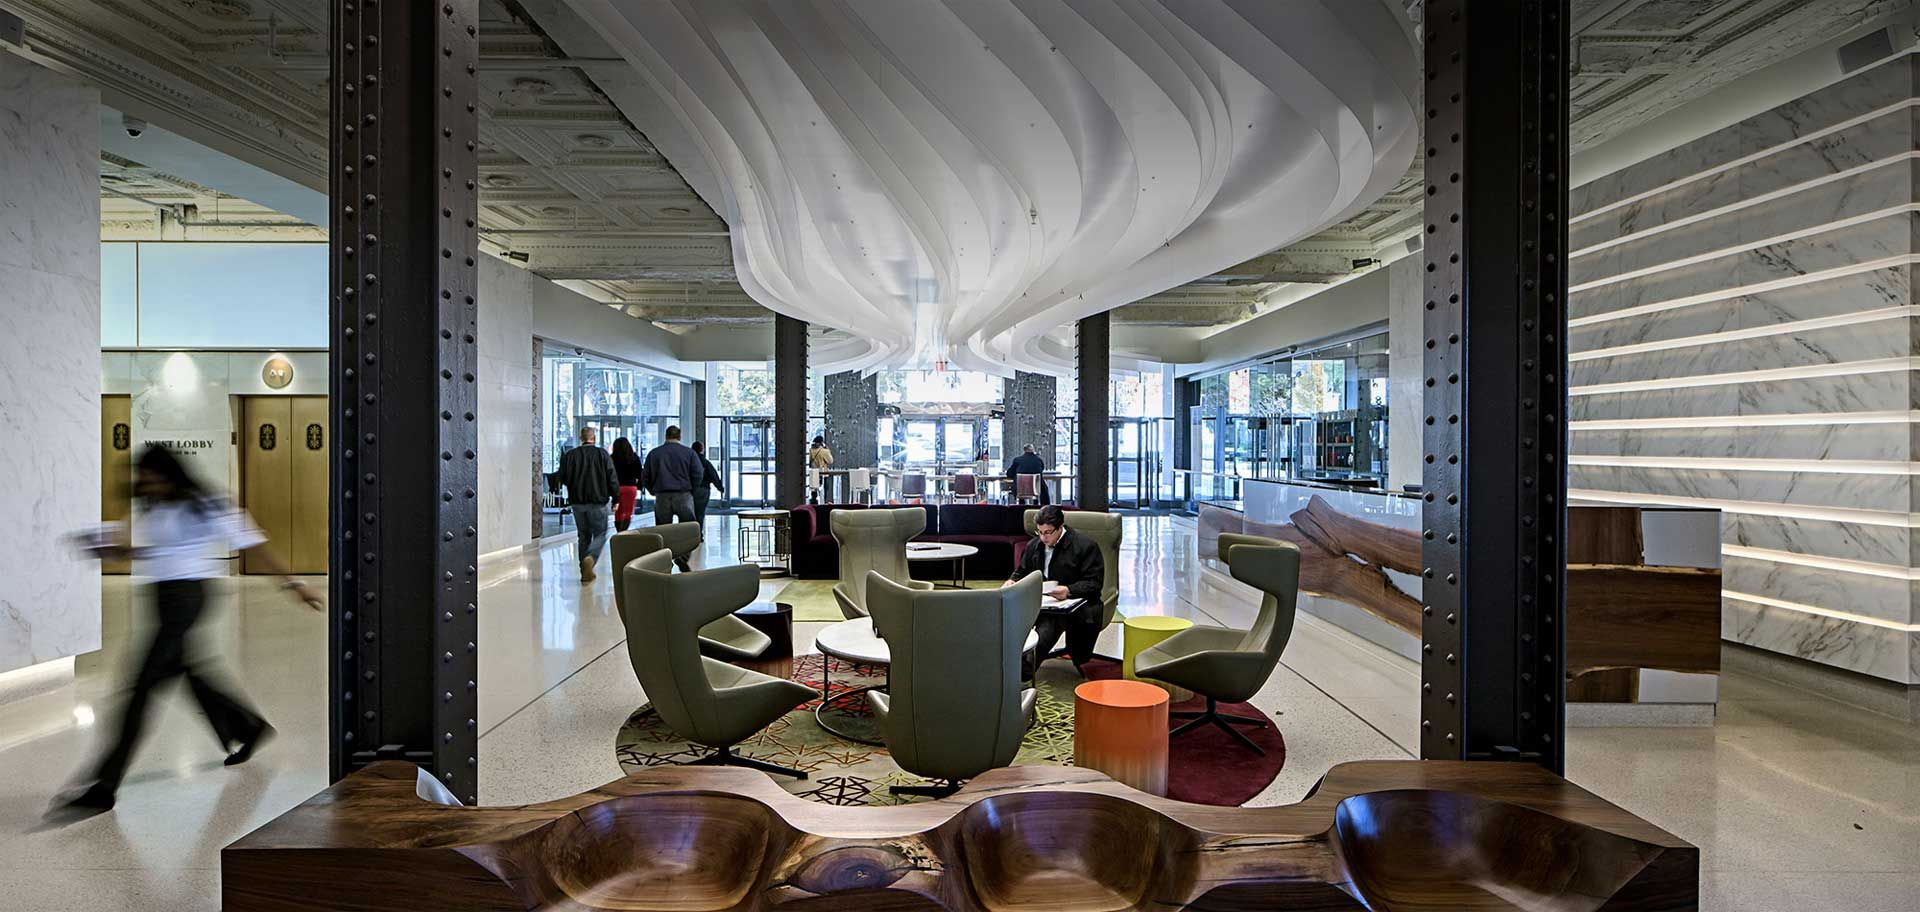 Detroit Michigan Architect & Interior Design Firm (With